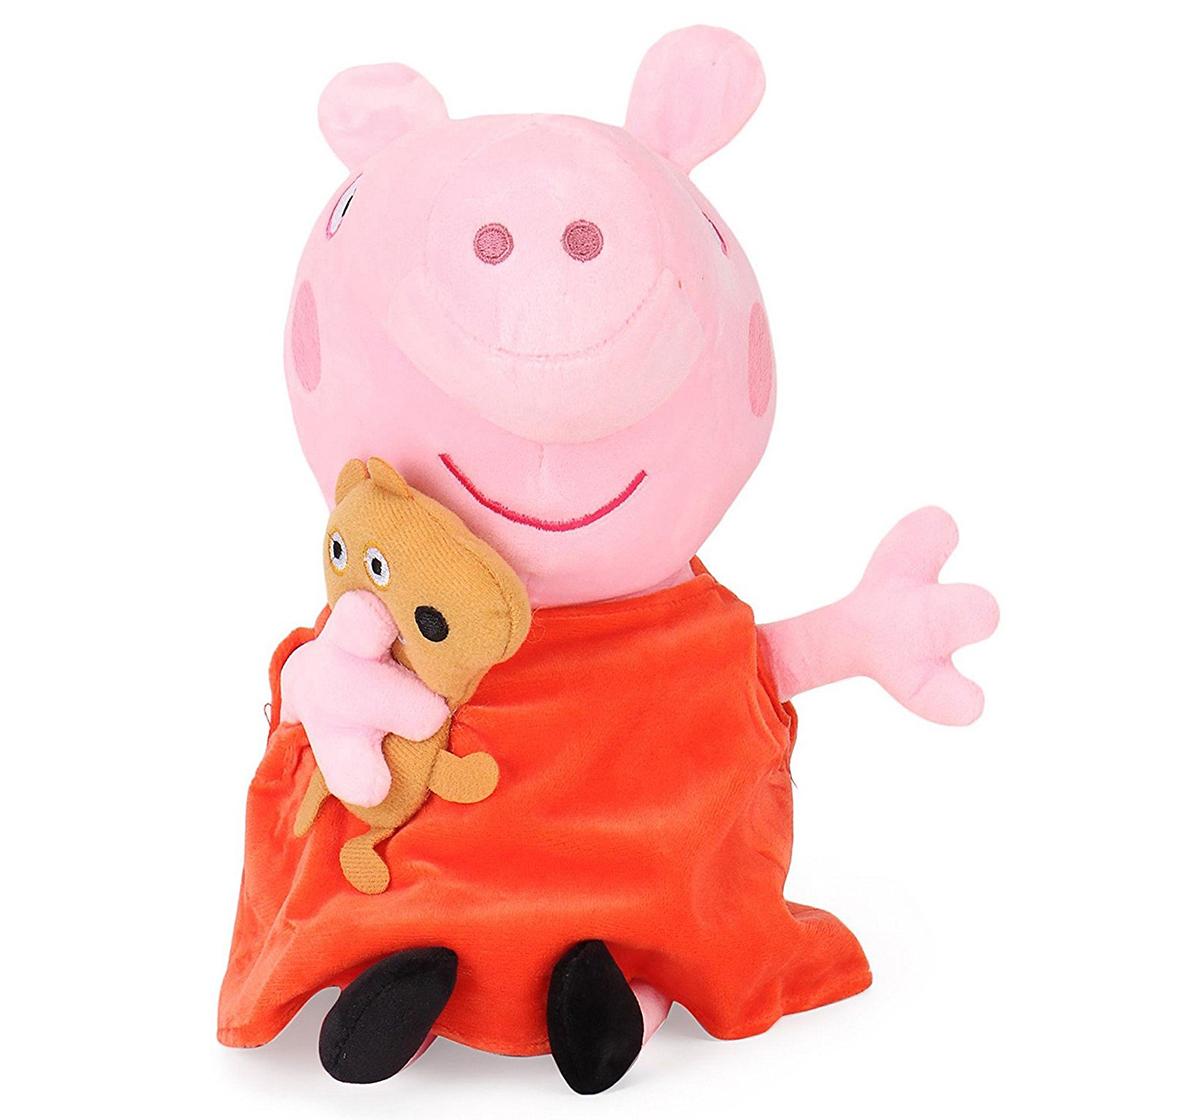 Peppa Pig | Peppa Pig with Bear 19 Cm Soft Toy for Kids age 2Y+ (Orange)